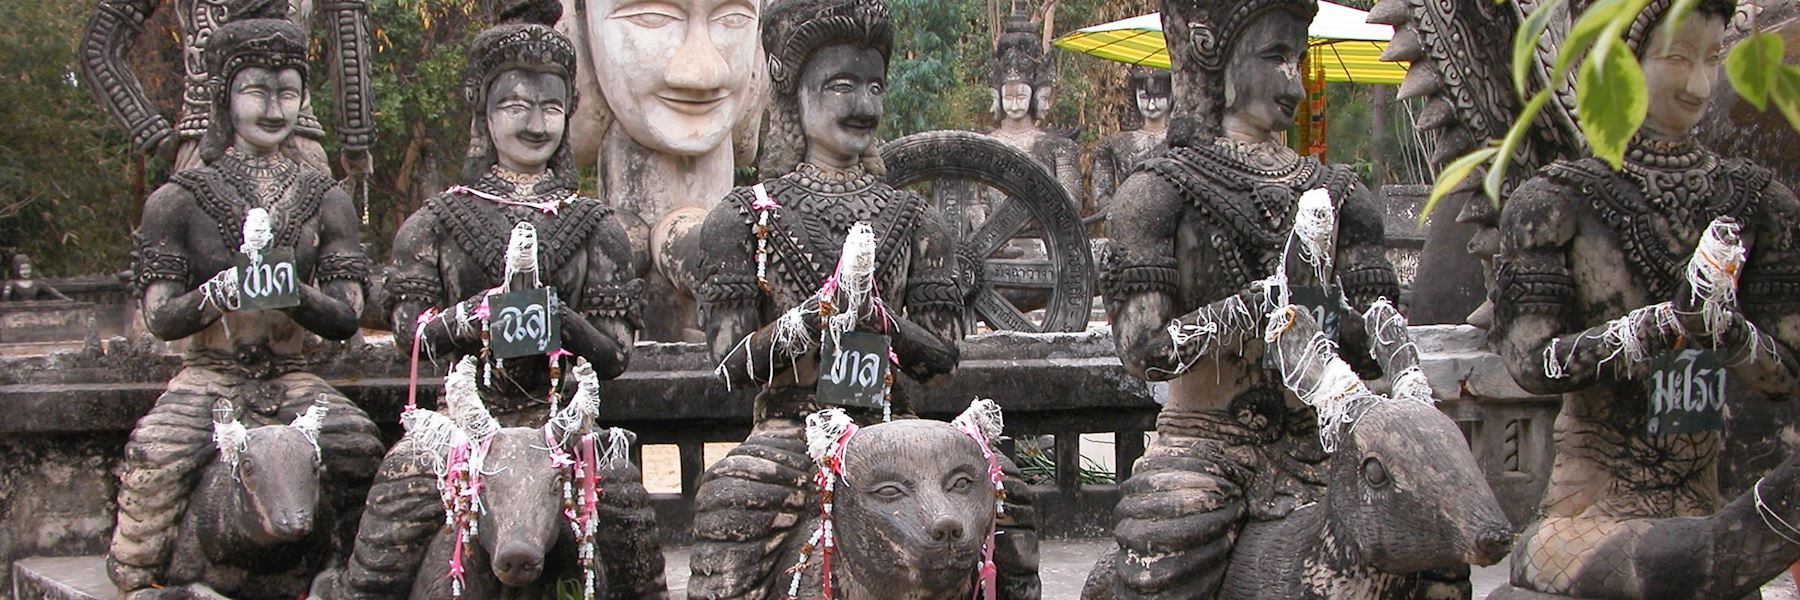 Visit Udon Thani, Thailand